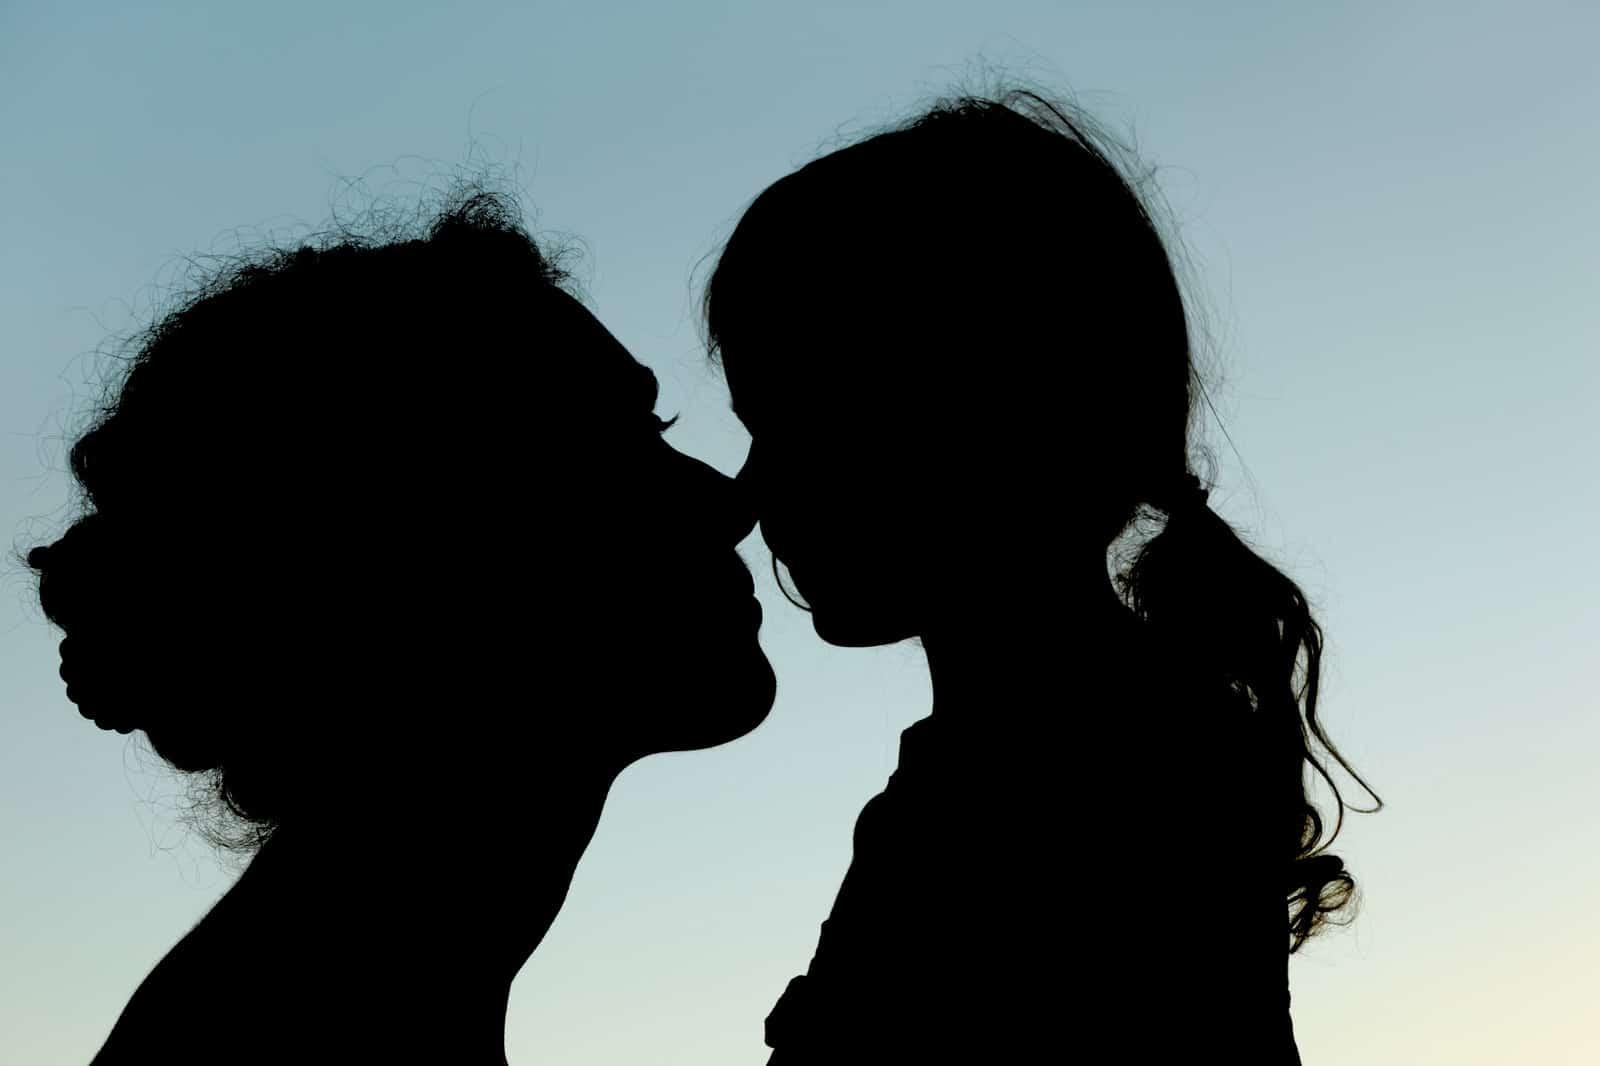 Rich Vaughn Blog: UK Mom-Daughter Cryopreservation Ruling